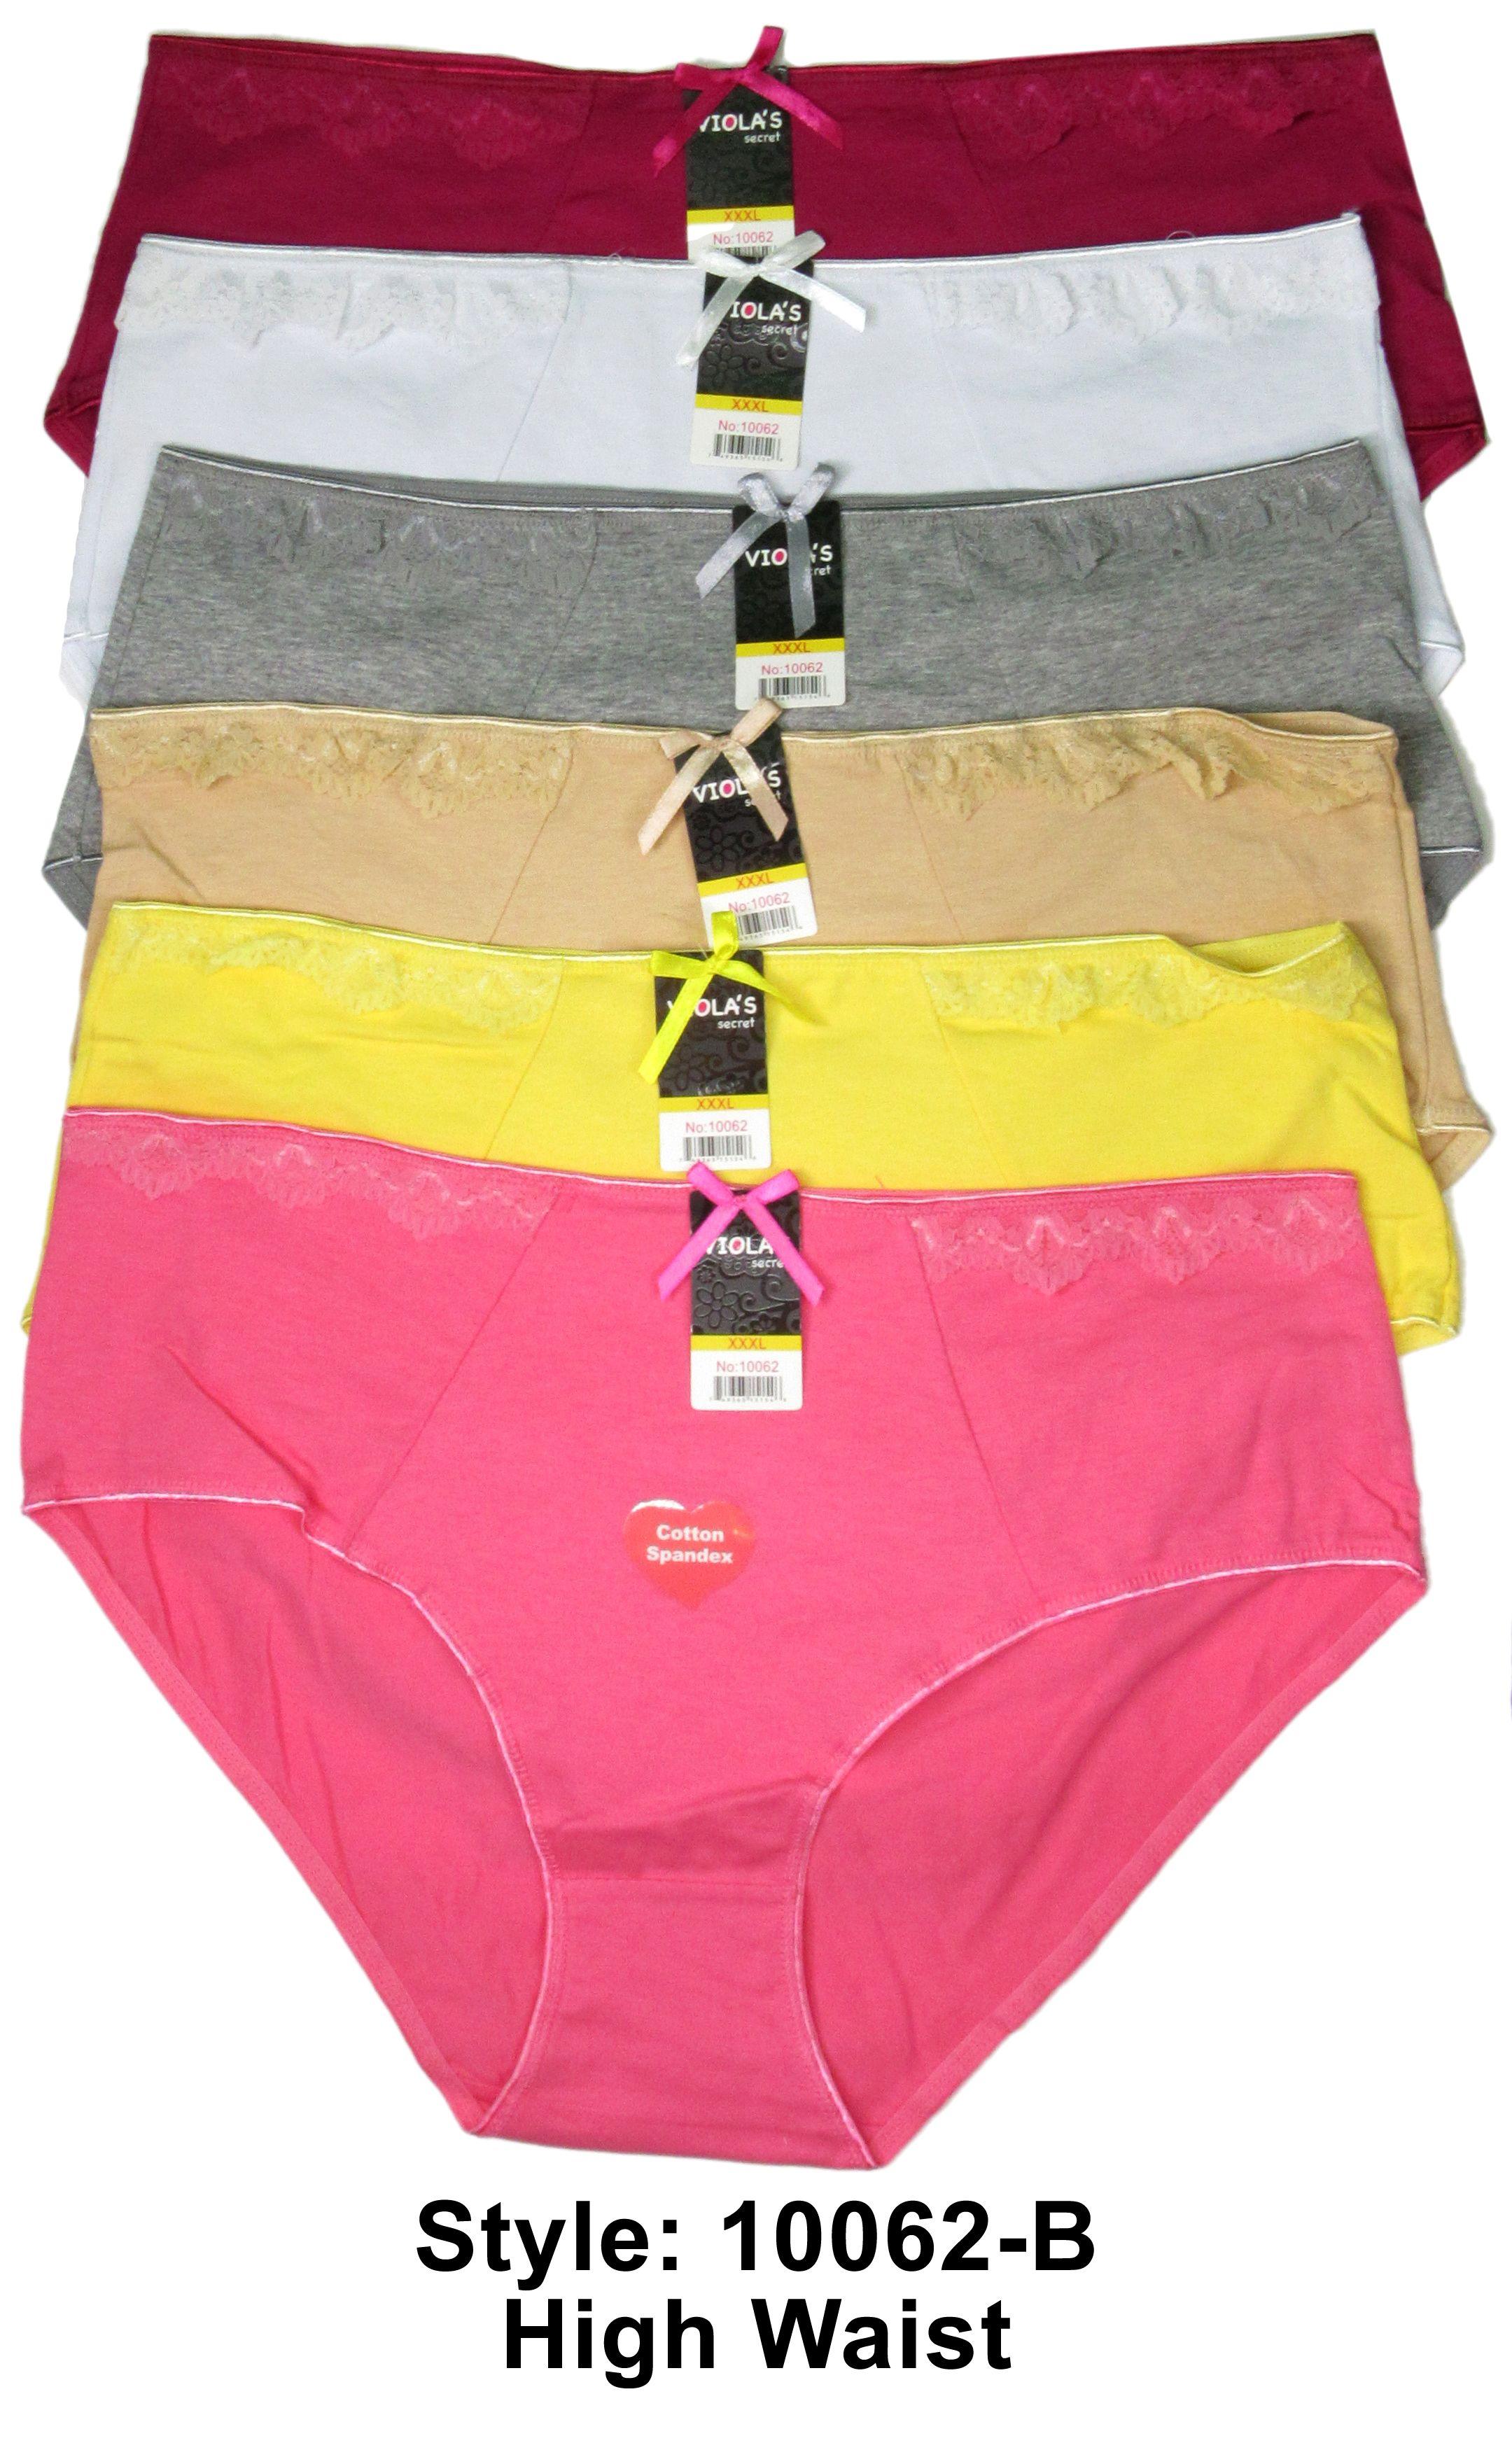 46ddb1358af 6 Women Plus Size High Waist Underwear Brief Panty Full Coverage ...